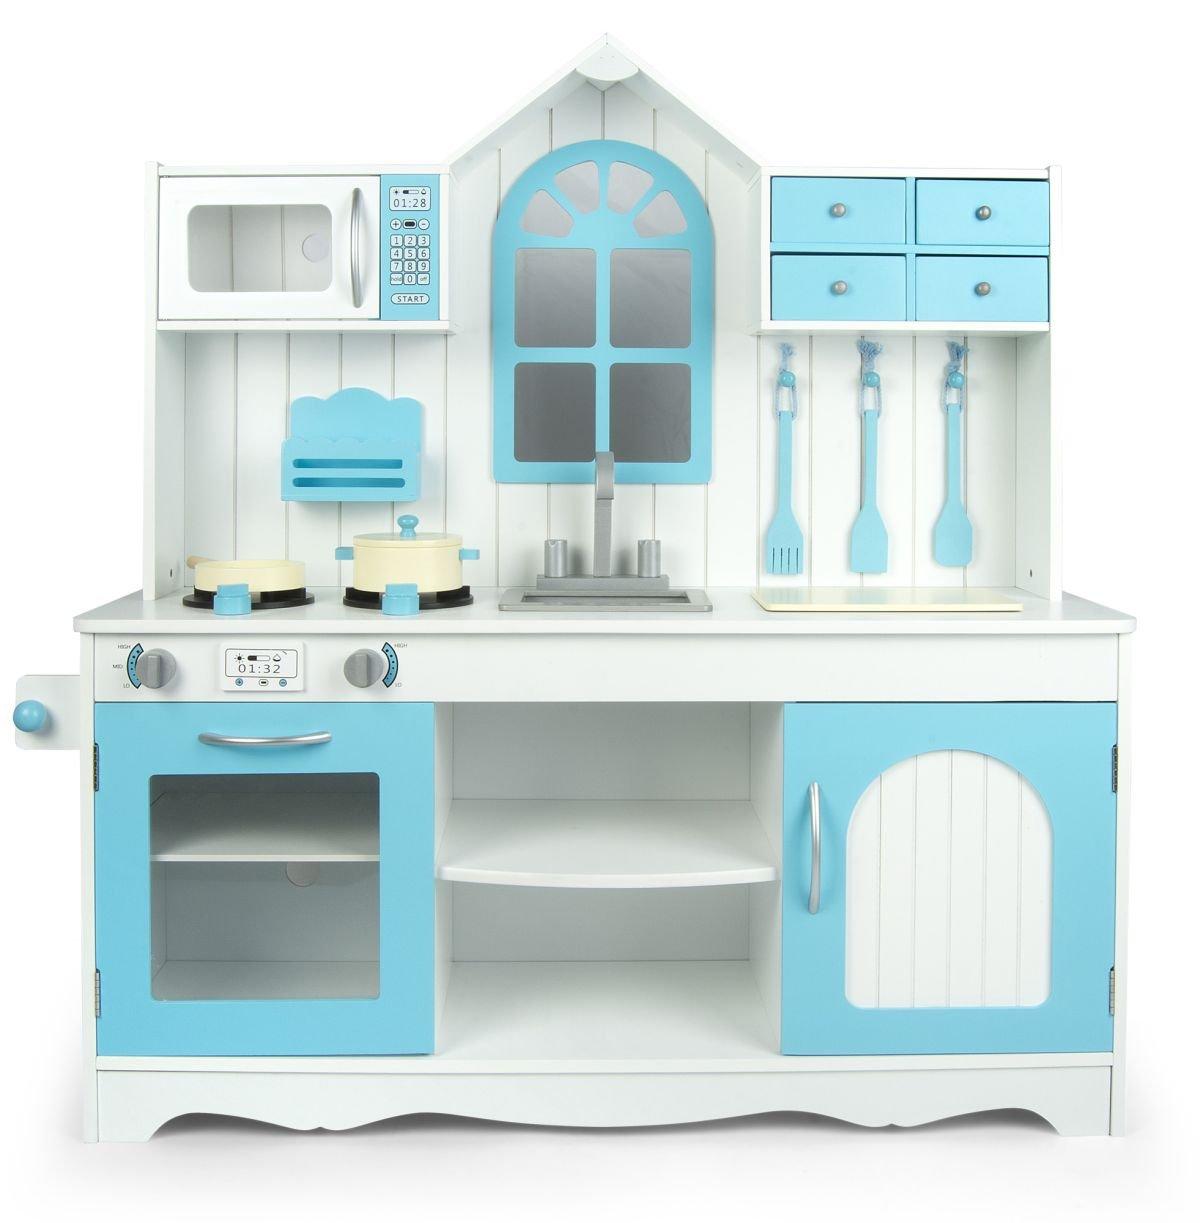 Leomark Cocina Exclusive Royal Azul, Cocina de juguete con accesorios, Juguete para Niñas, color azul, Juego de Imitación, cocina madera infantil, cocina Dimensiones: 106 x 32 x 109 cm. 102/244013A